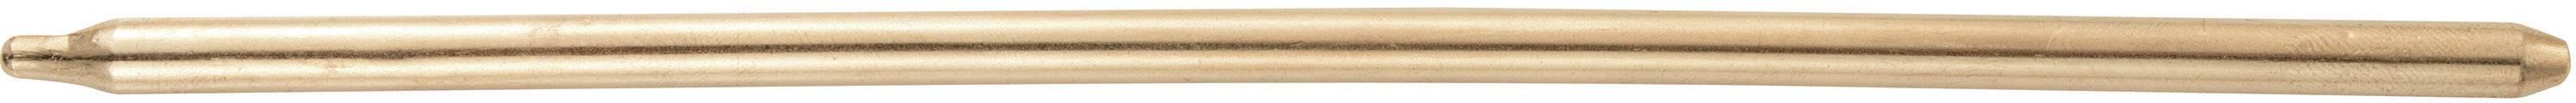 Teplovodivá trubka Sinter-Heatpipe Gelid CP-S6200-01, 35 W